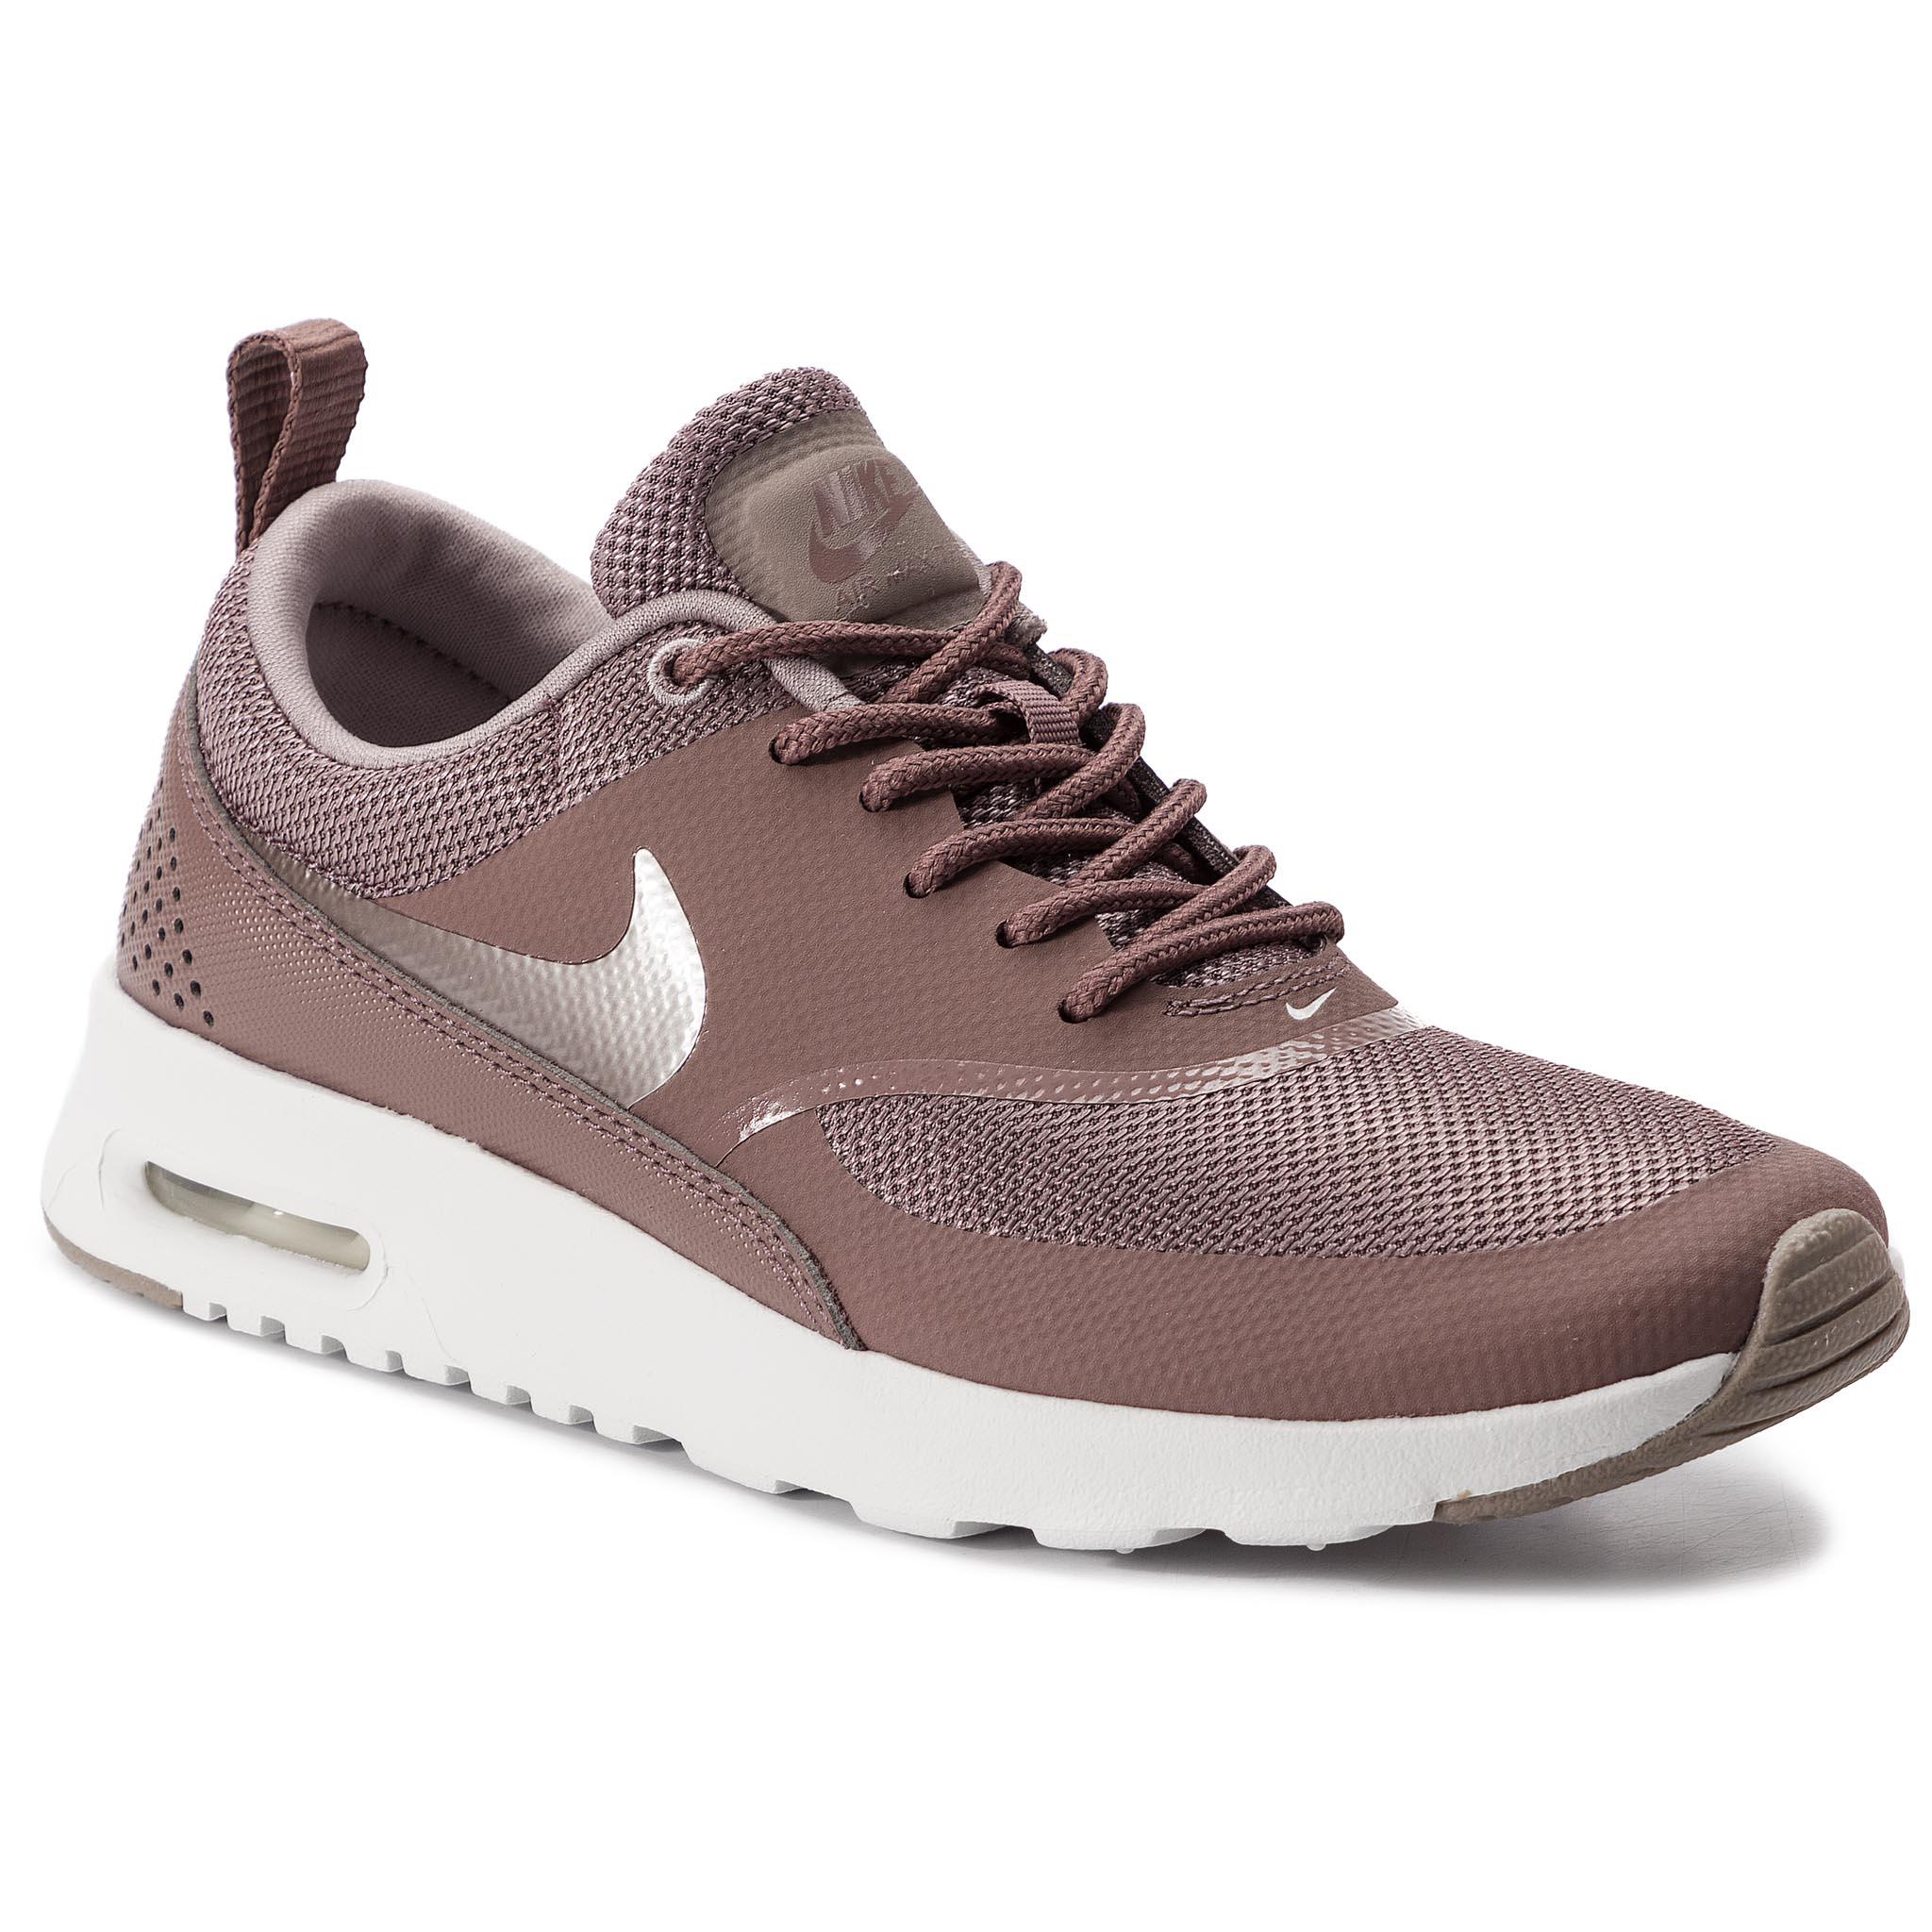 Shoes NIKE Air Max Thea 599409 108 WhiteBlack Sneakers